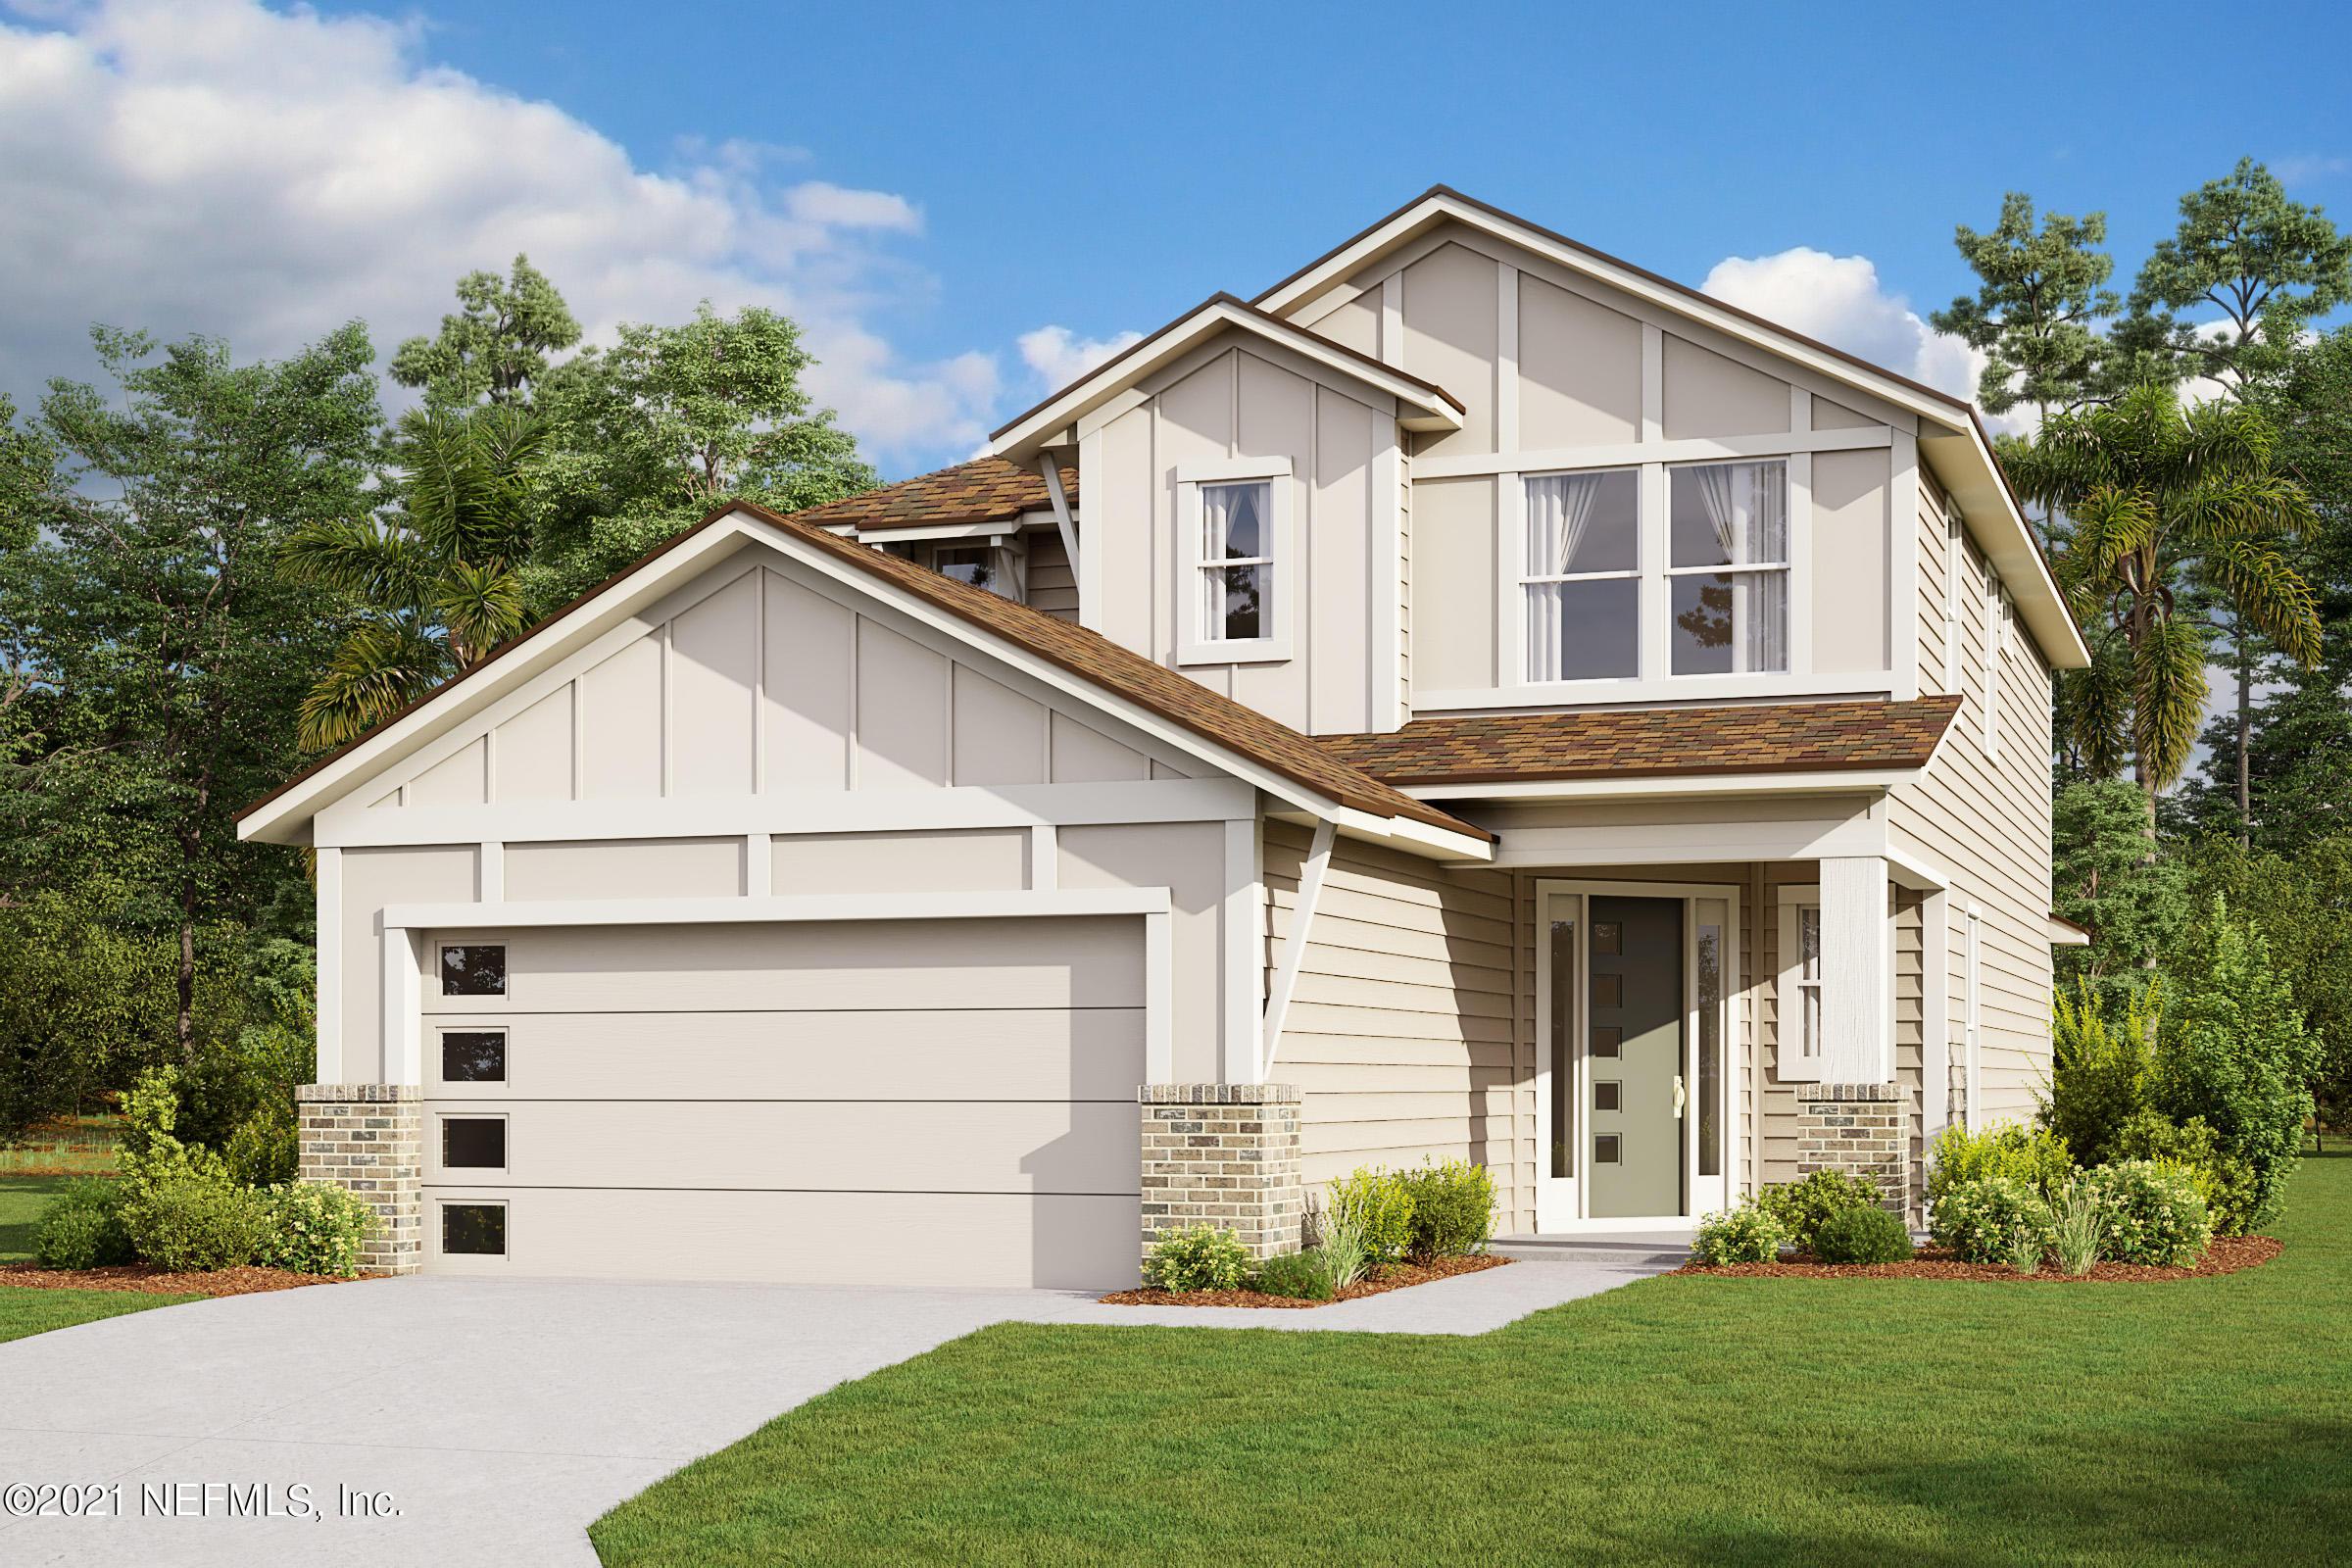 306 MILLENIA, PONTE VEDRA, FLORIDA 32081, 4 Bedrooms Bedrooms, ,3 BathroomsBathrooms,Residential,For sale,MILLENIA,1115647